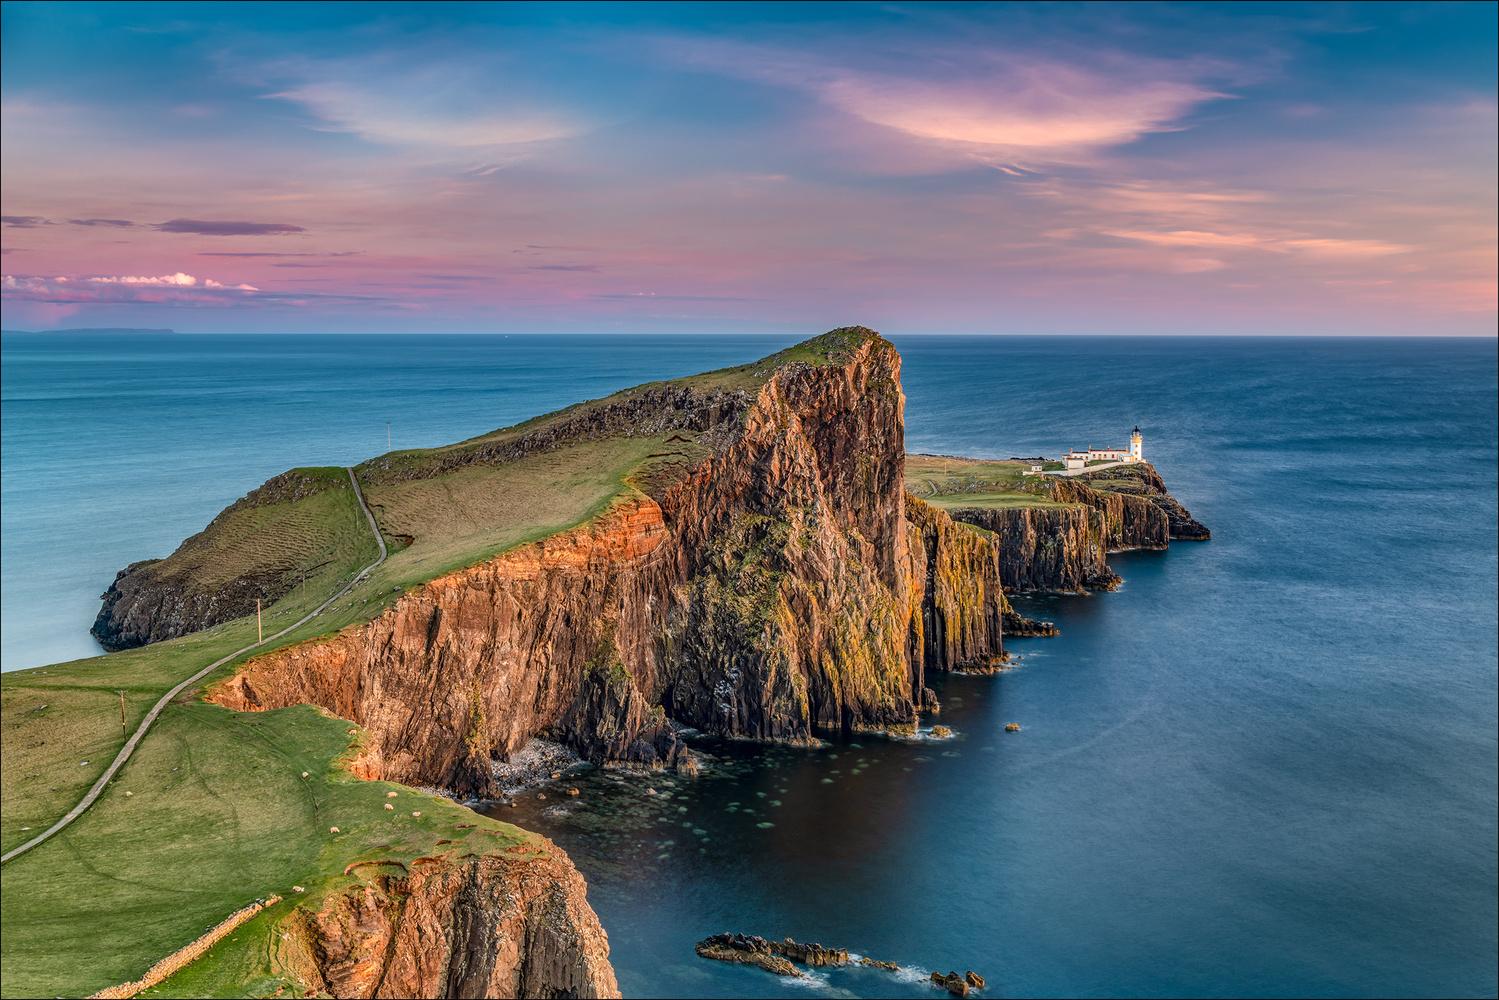 Neist Point, Isle of Skye by Mark Heavisides